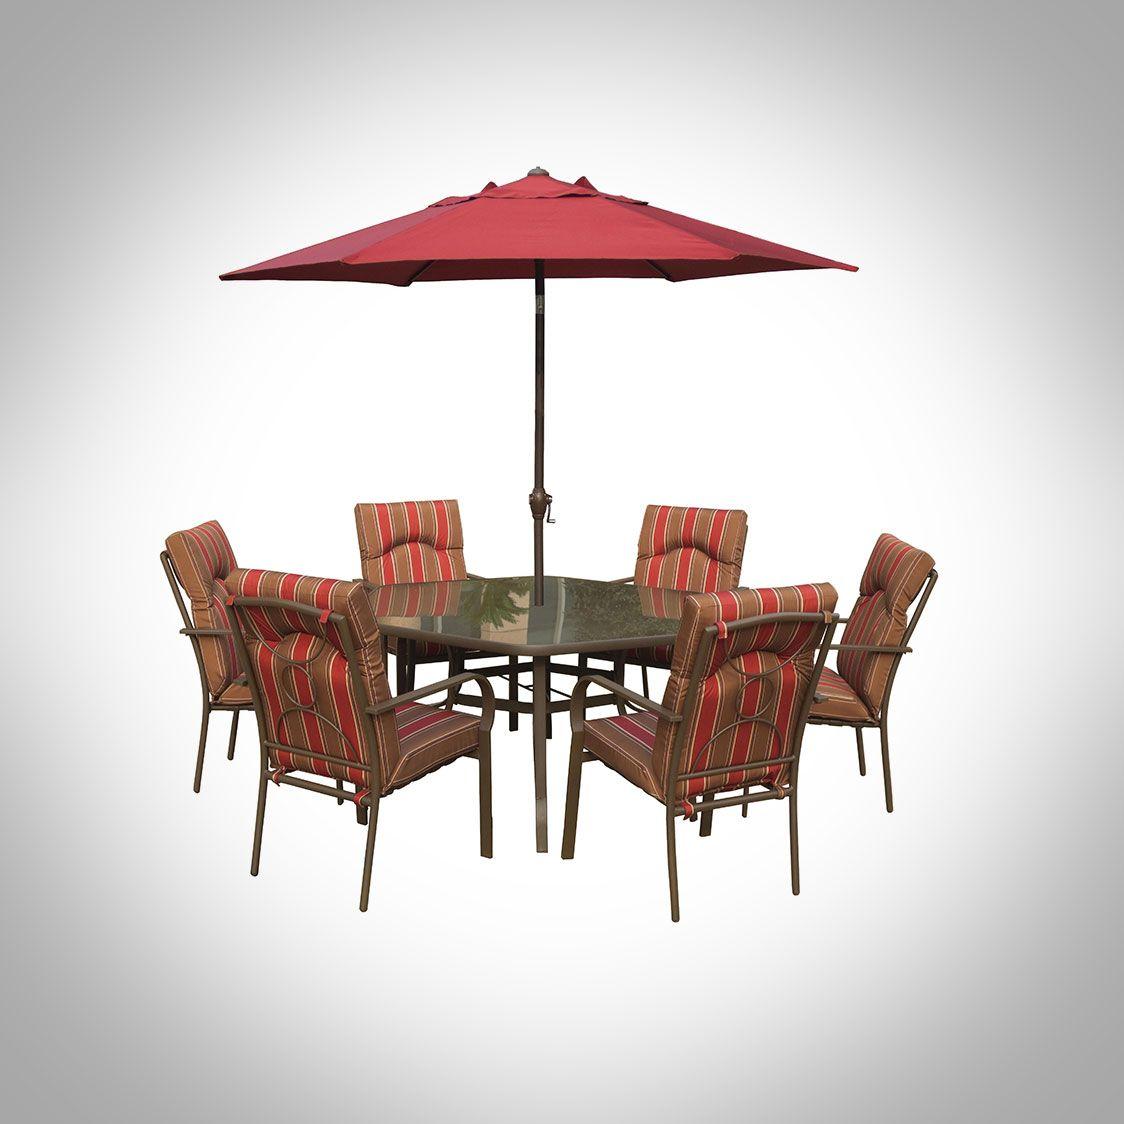 Amalfi 6 Seater Hexagonal Dining Set With Burgundy Parasol 400 x 300